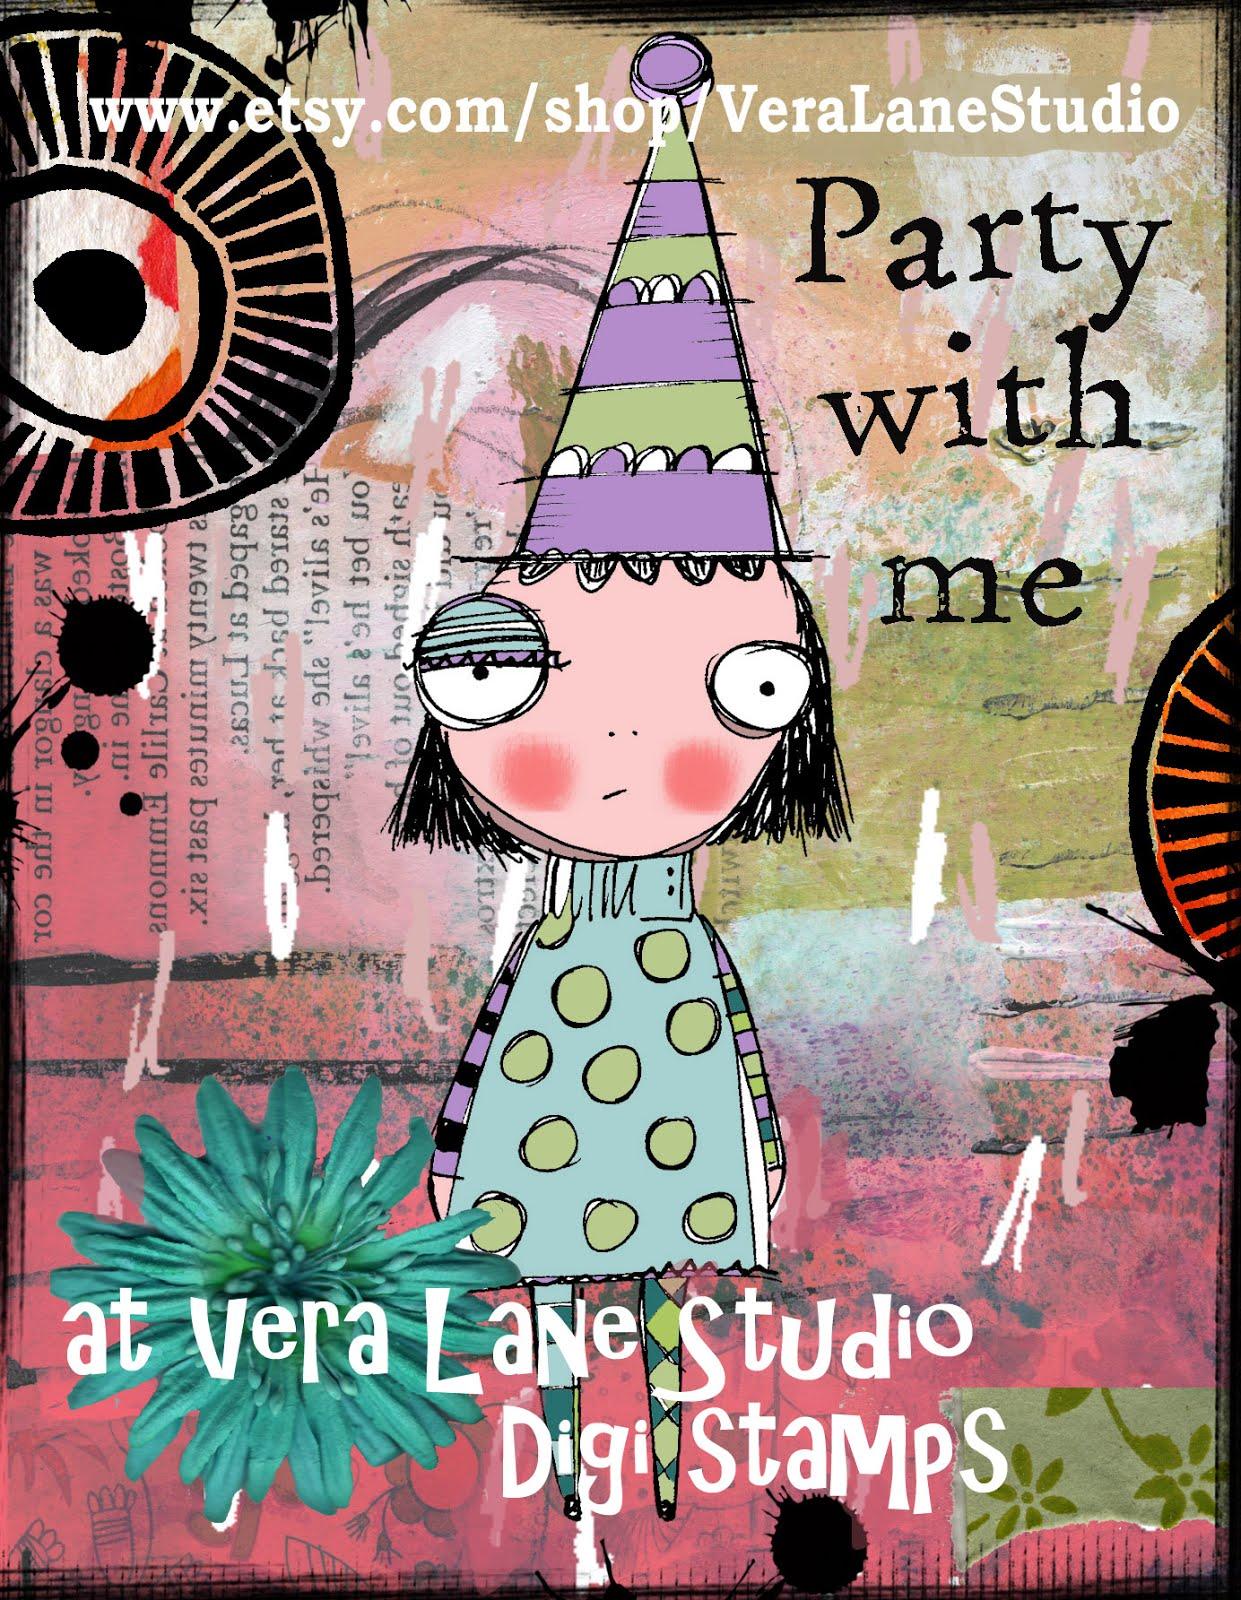 Vera Lane Studio